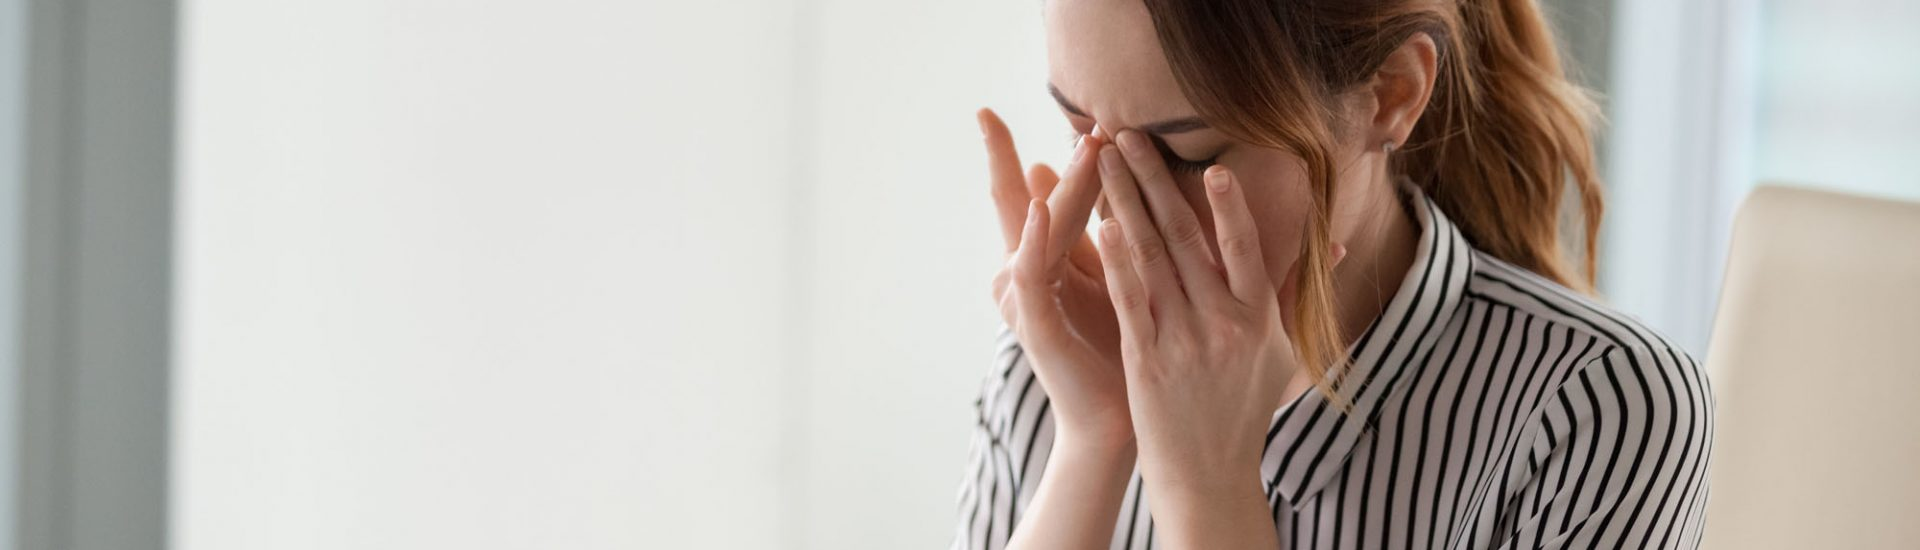 Augenschmerzen: Symptome, Ursachen, Diagnose & Therapie